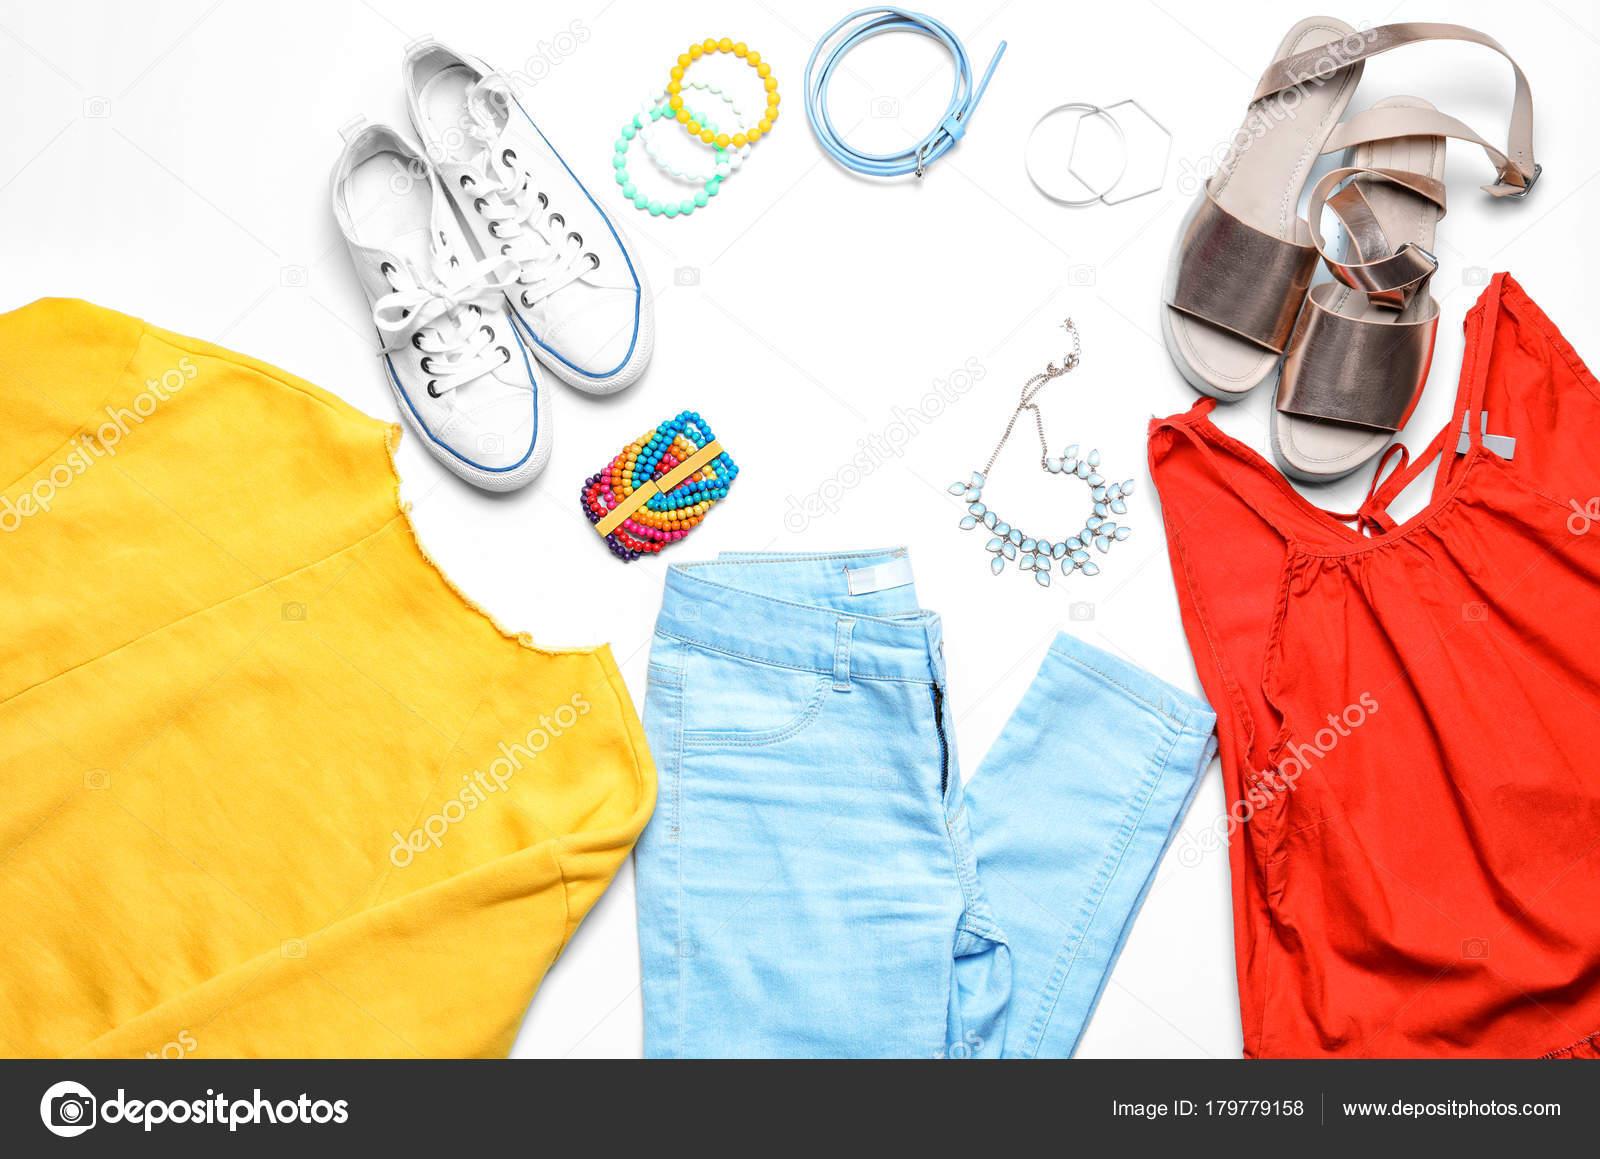 f7fe57204a5c Κομψό Σύνολο Casual Γυναικεία Ρούχα Λευκό Φόντο — Φωτογραφία Αρχείου ...